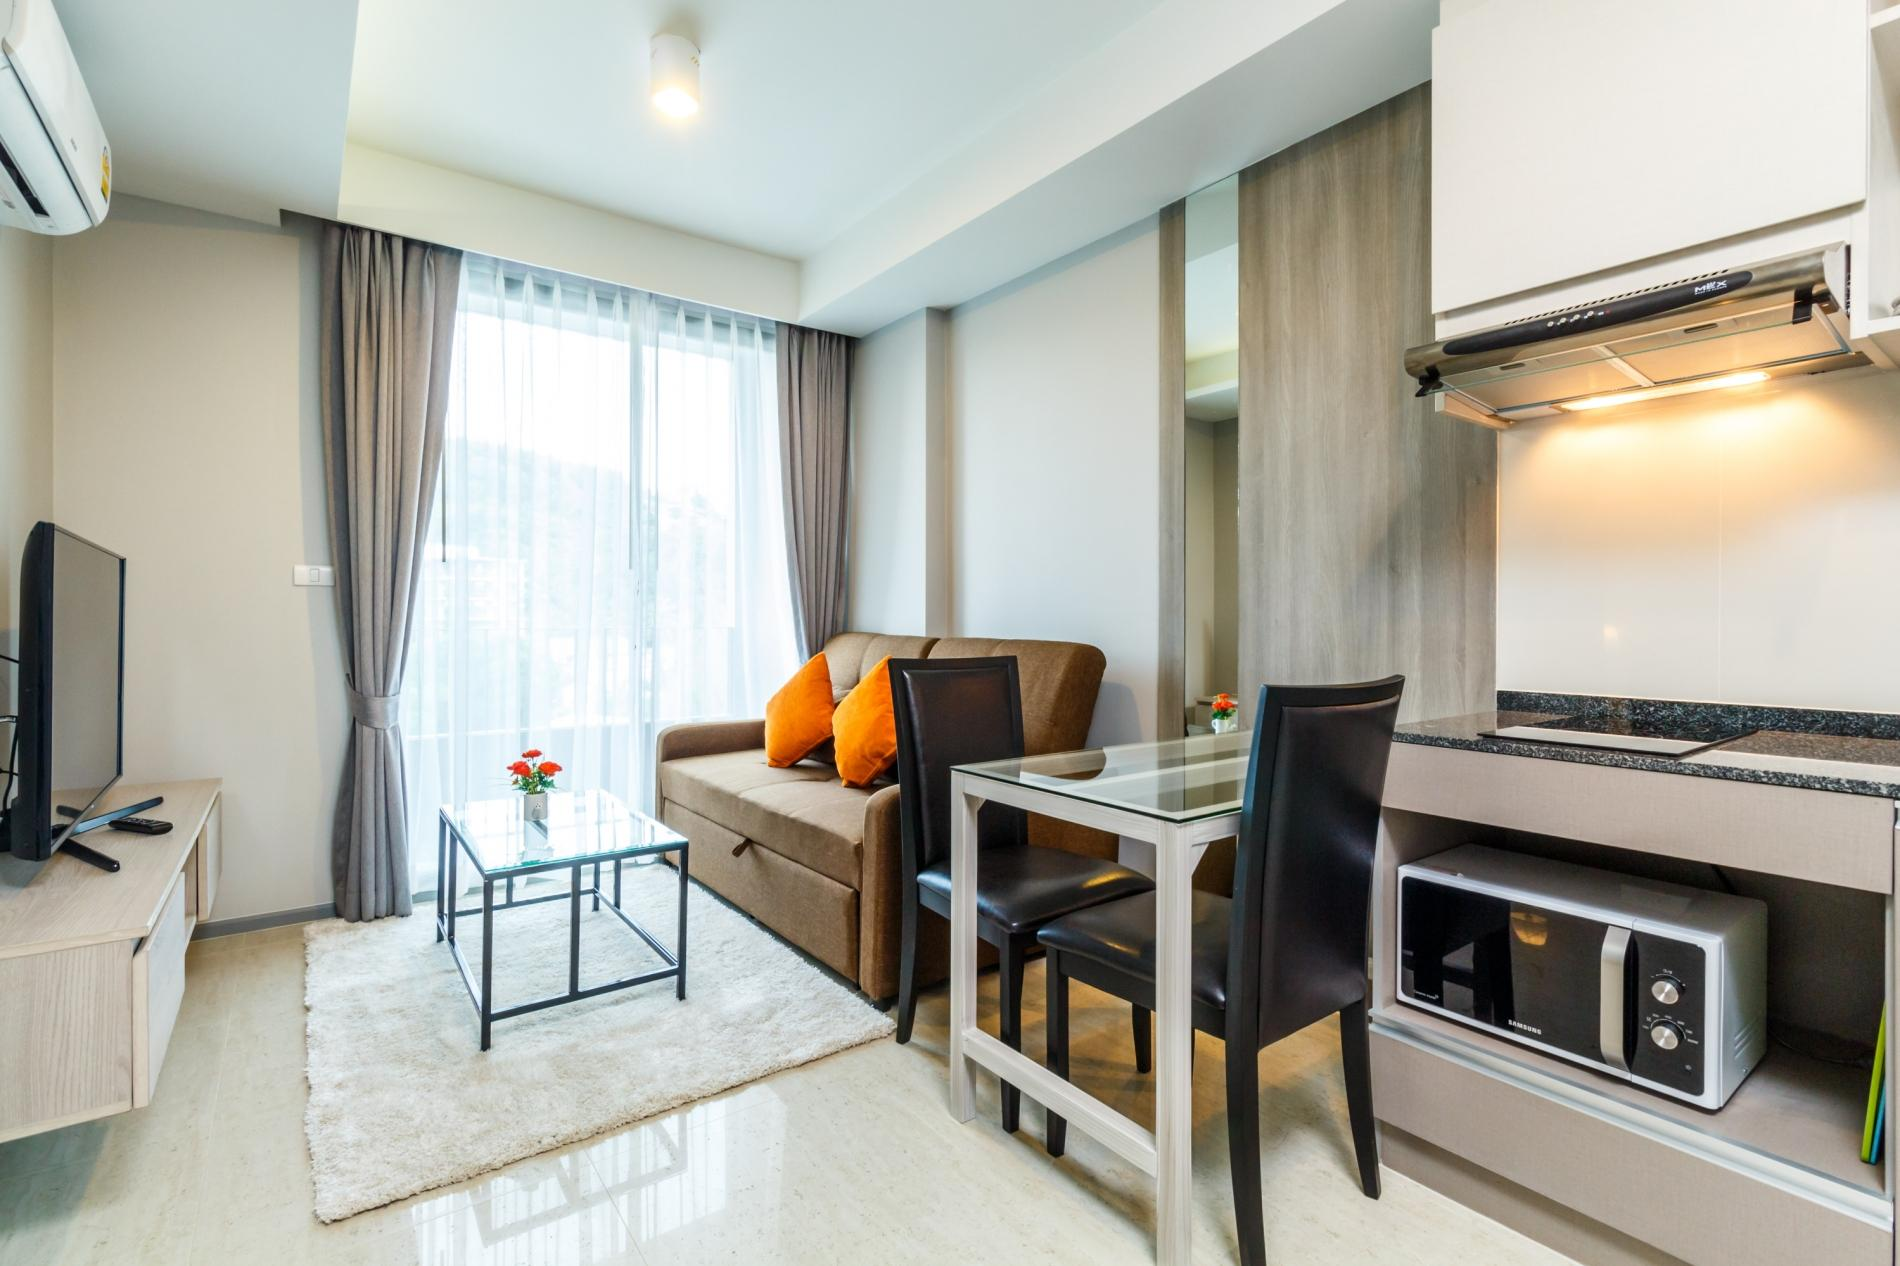 6Av 703 - Large apartment in Surin beach photo 20095157